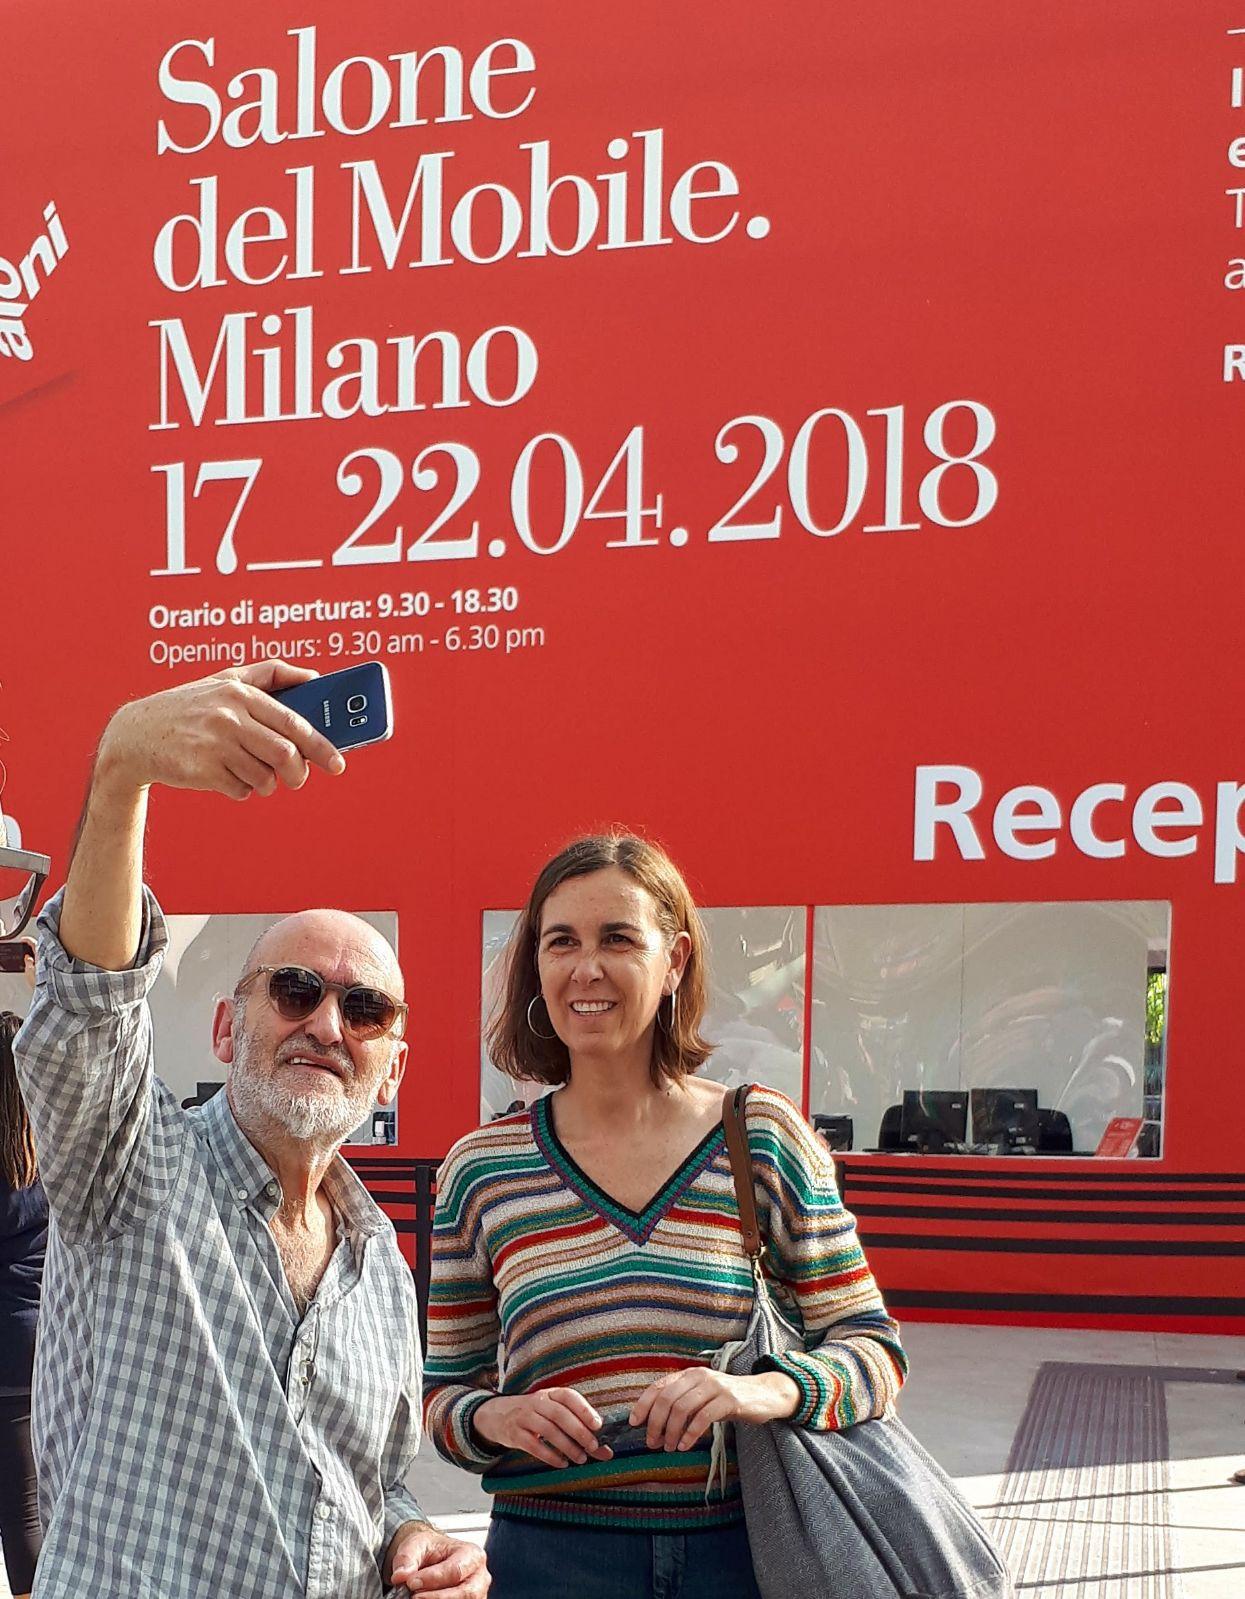 Feria de milan 2018 m s dise o m s mobiliario olut for Feria de milan